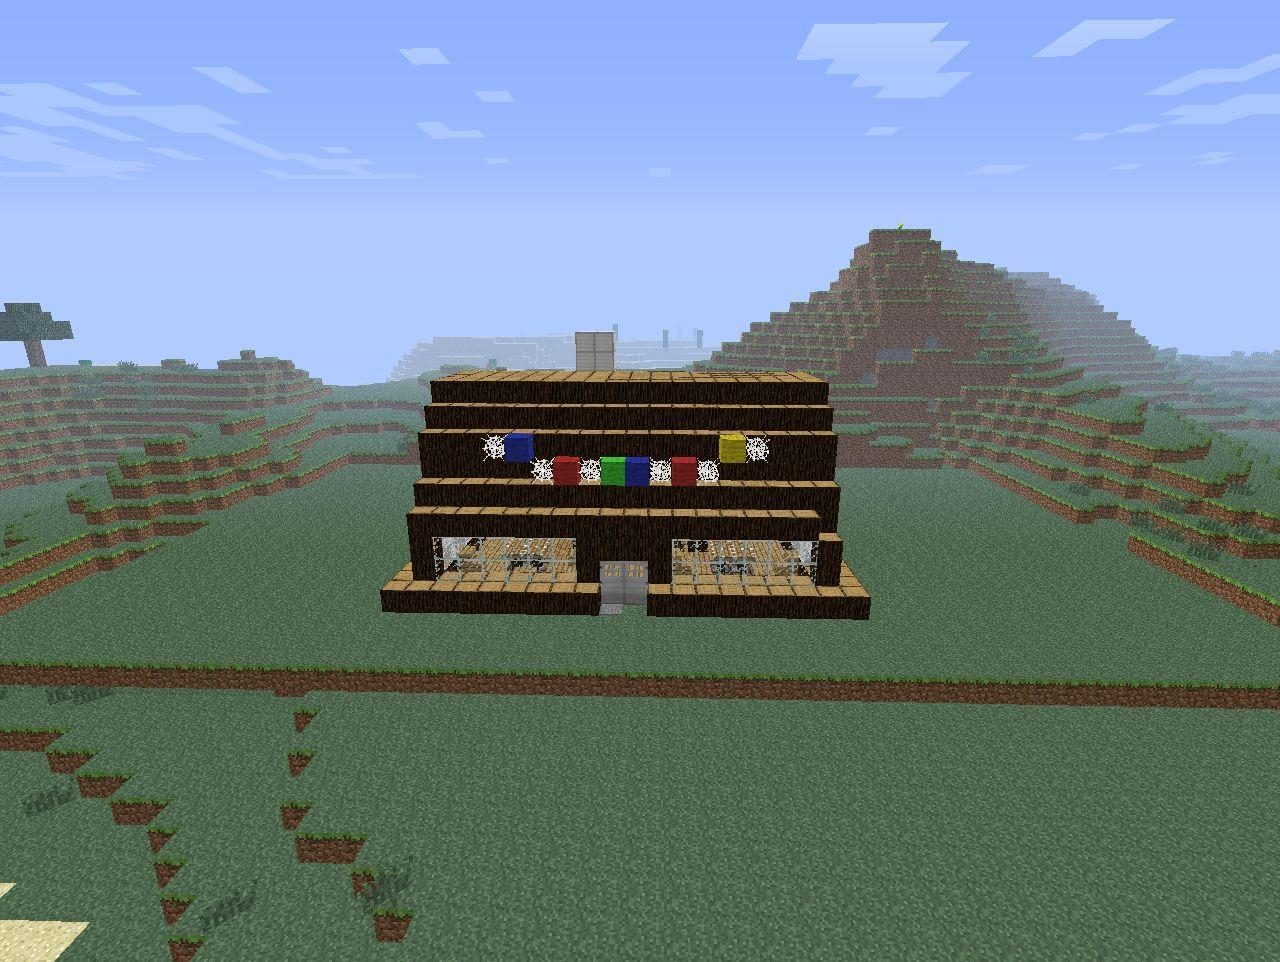 the krusty krab 574679 2 the krusty krab 2 diamonds The Krusty Krab Minecraft